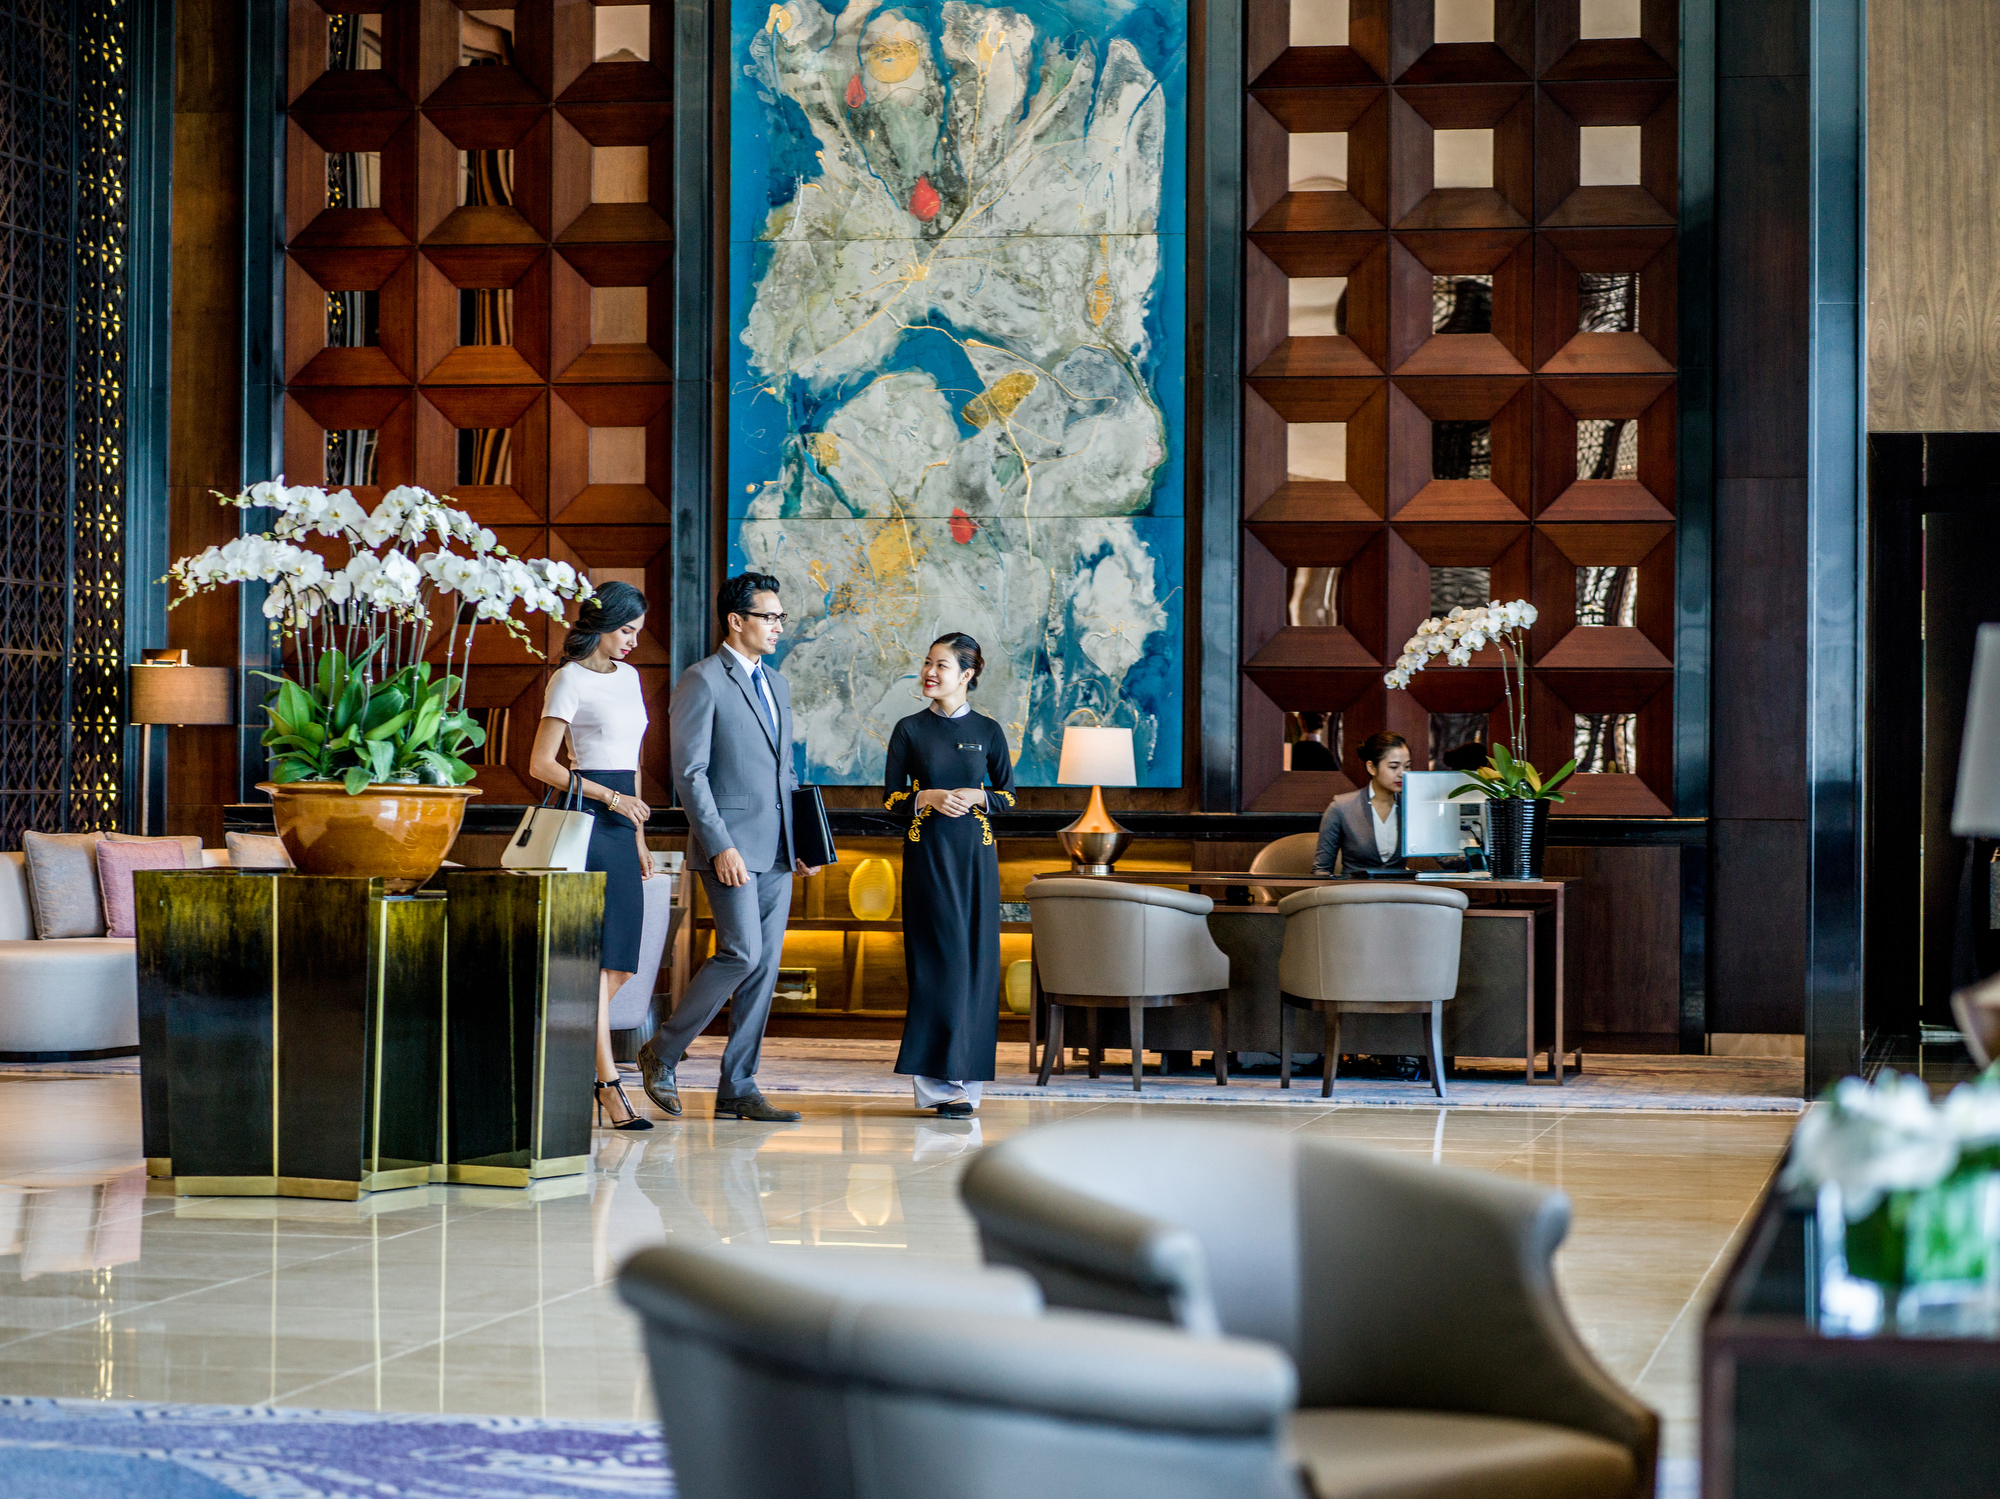 Hotels and Resorts photography for InterContinental Landmark 72 (IHG)Hanoi Vietnam by Mott Visuals - Photographer Justin Mott